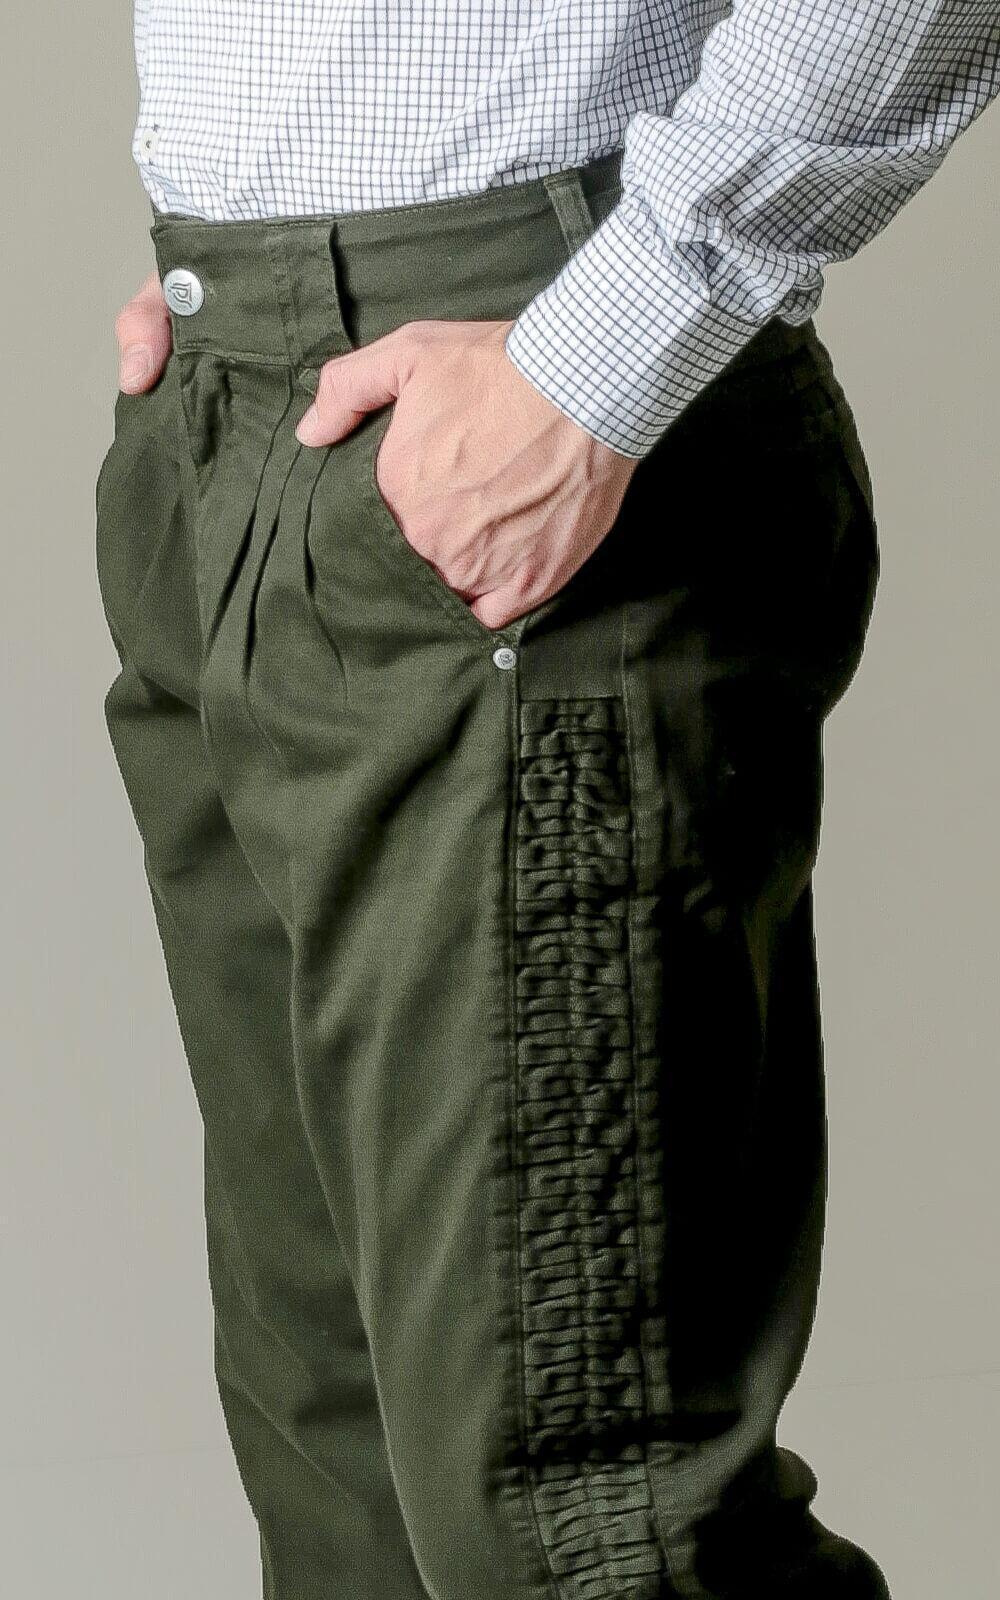 Bombacha Masculina Montaria com Elastano e Favos - Cor Verde Musgo